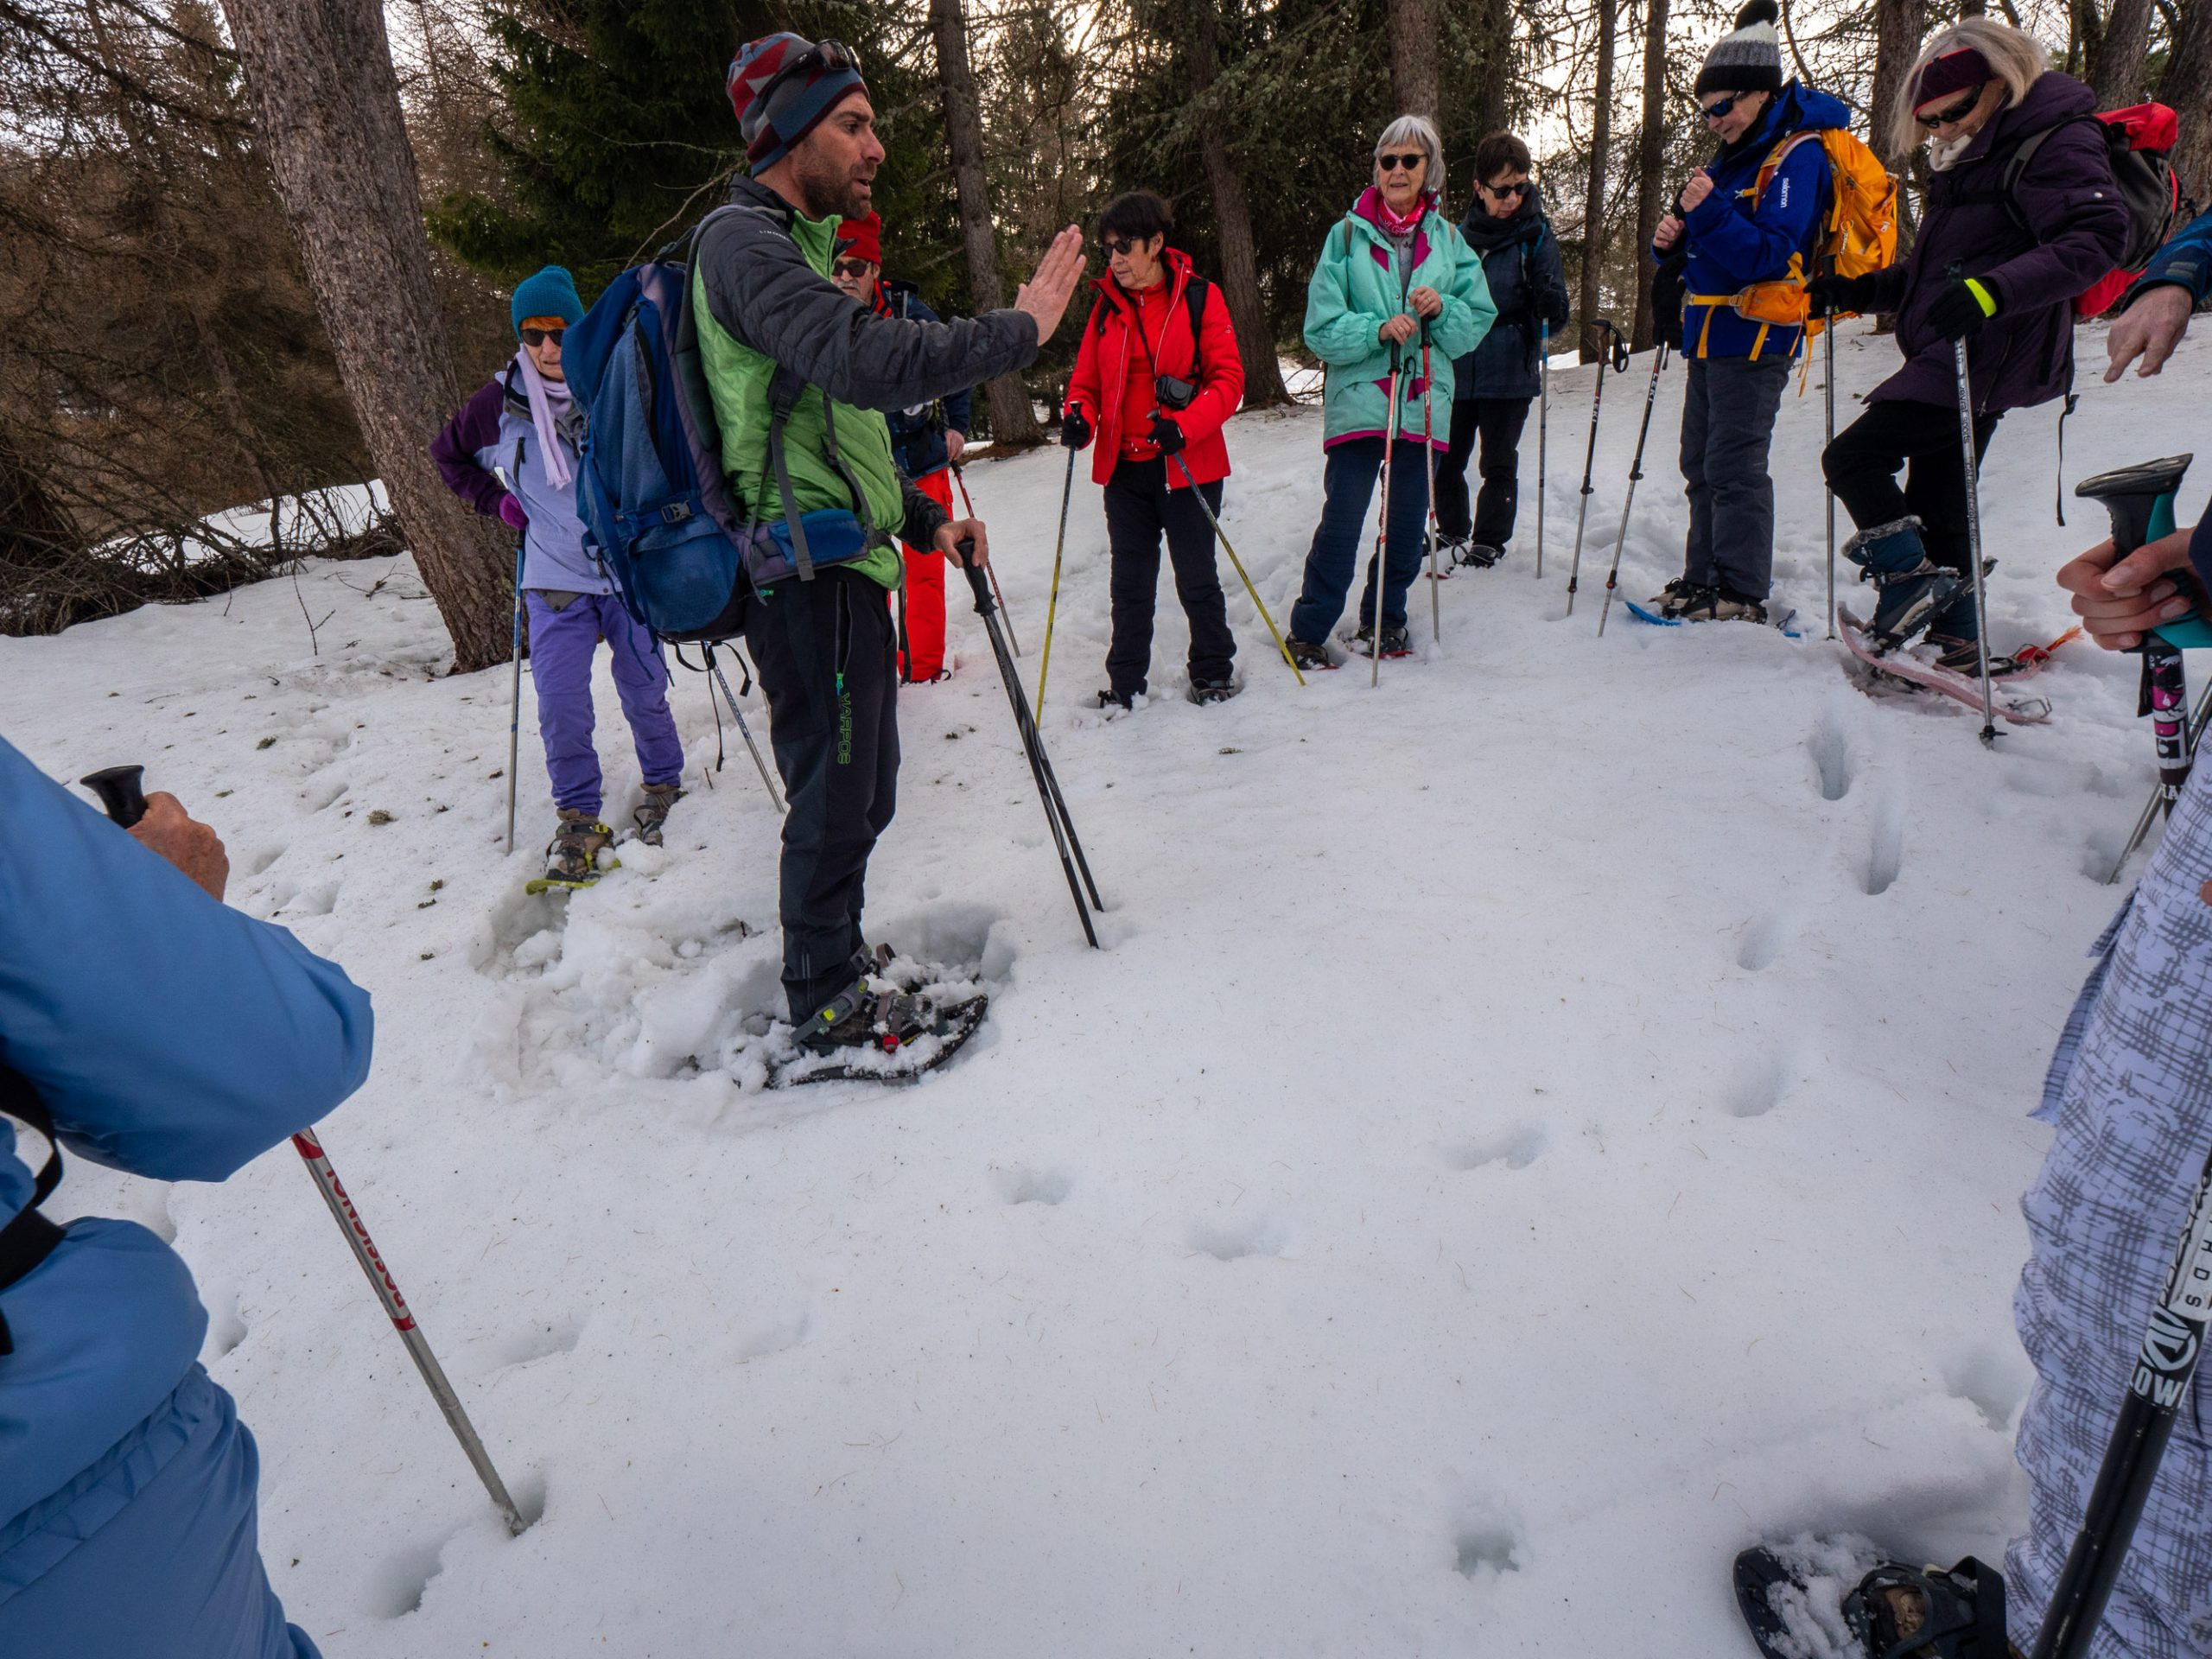 sneeuwschoen-wandelen